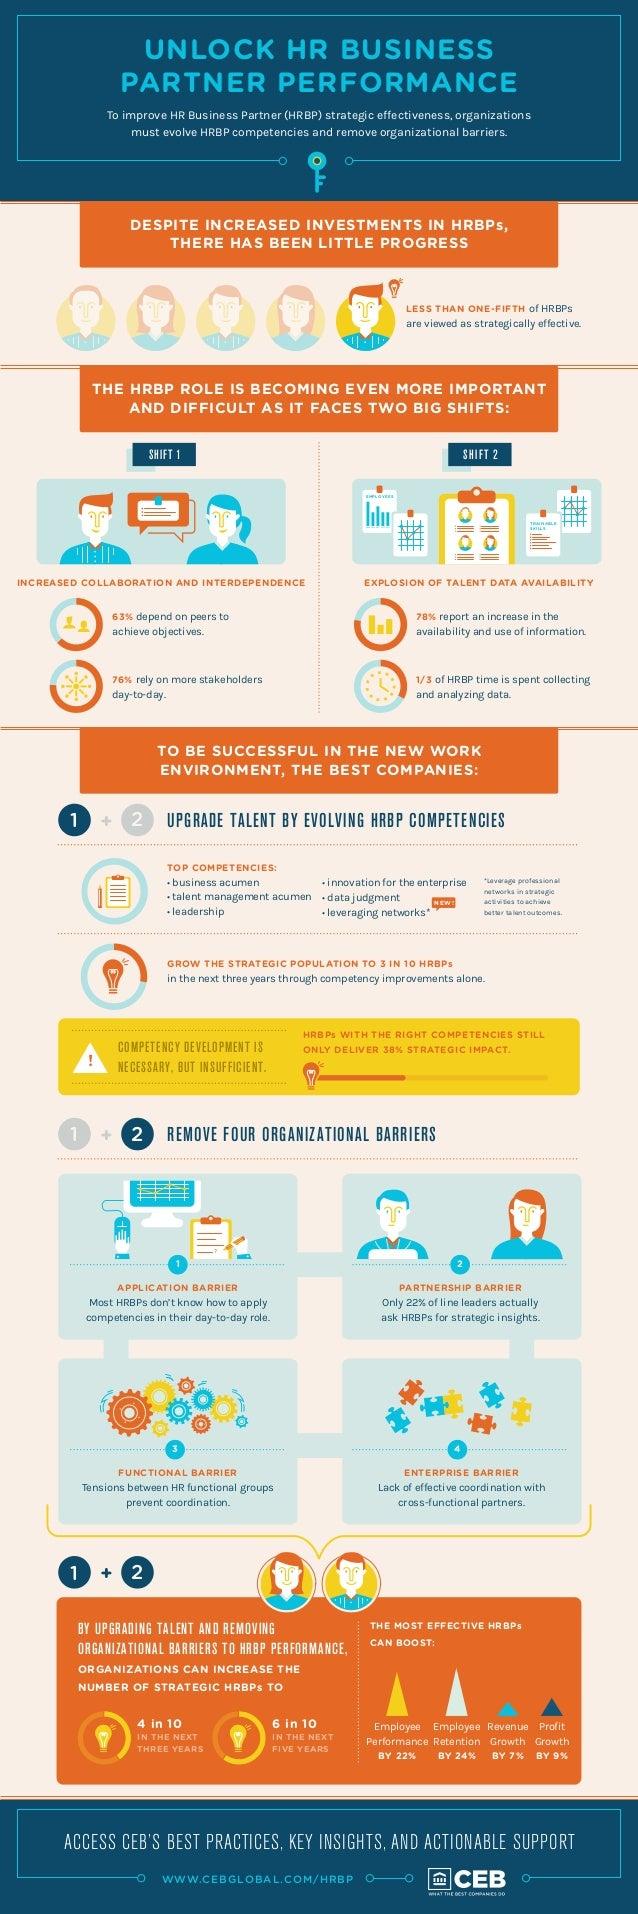 Unlock HR Business Partner Performance